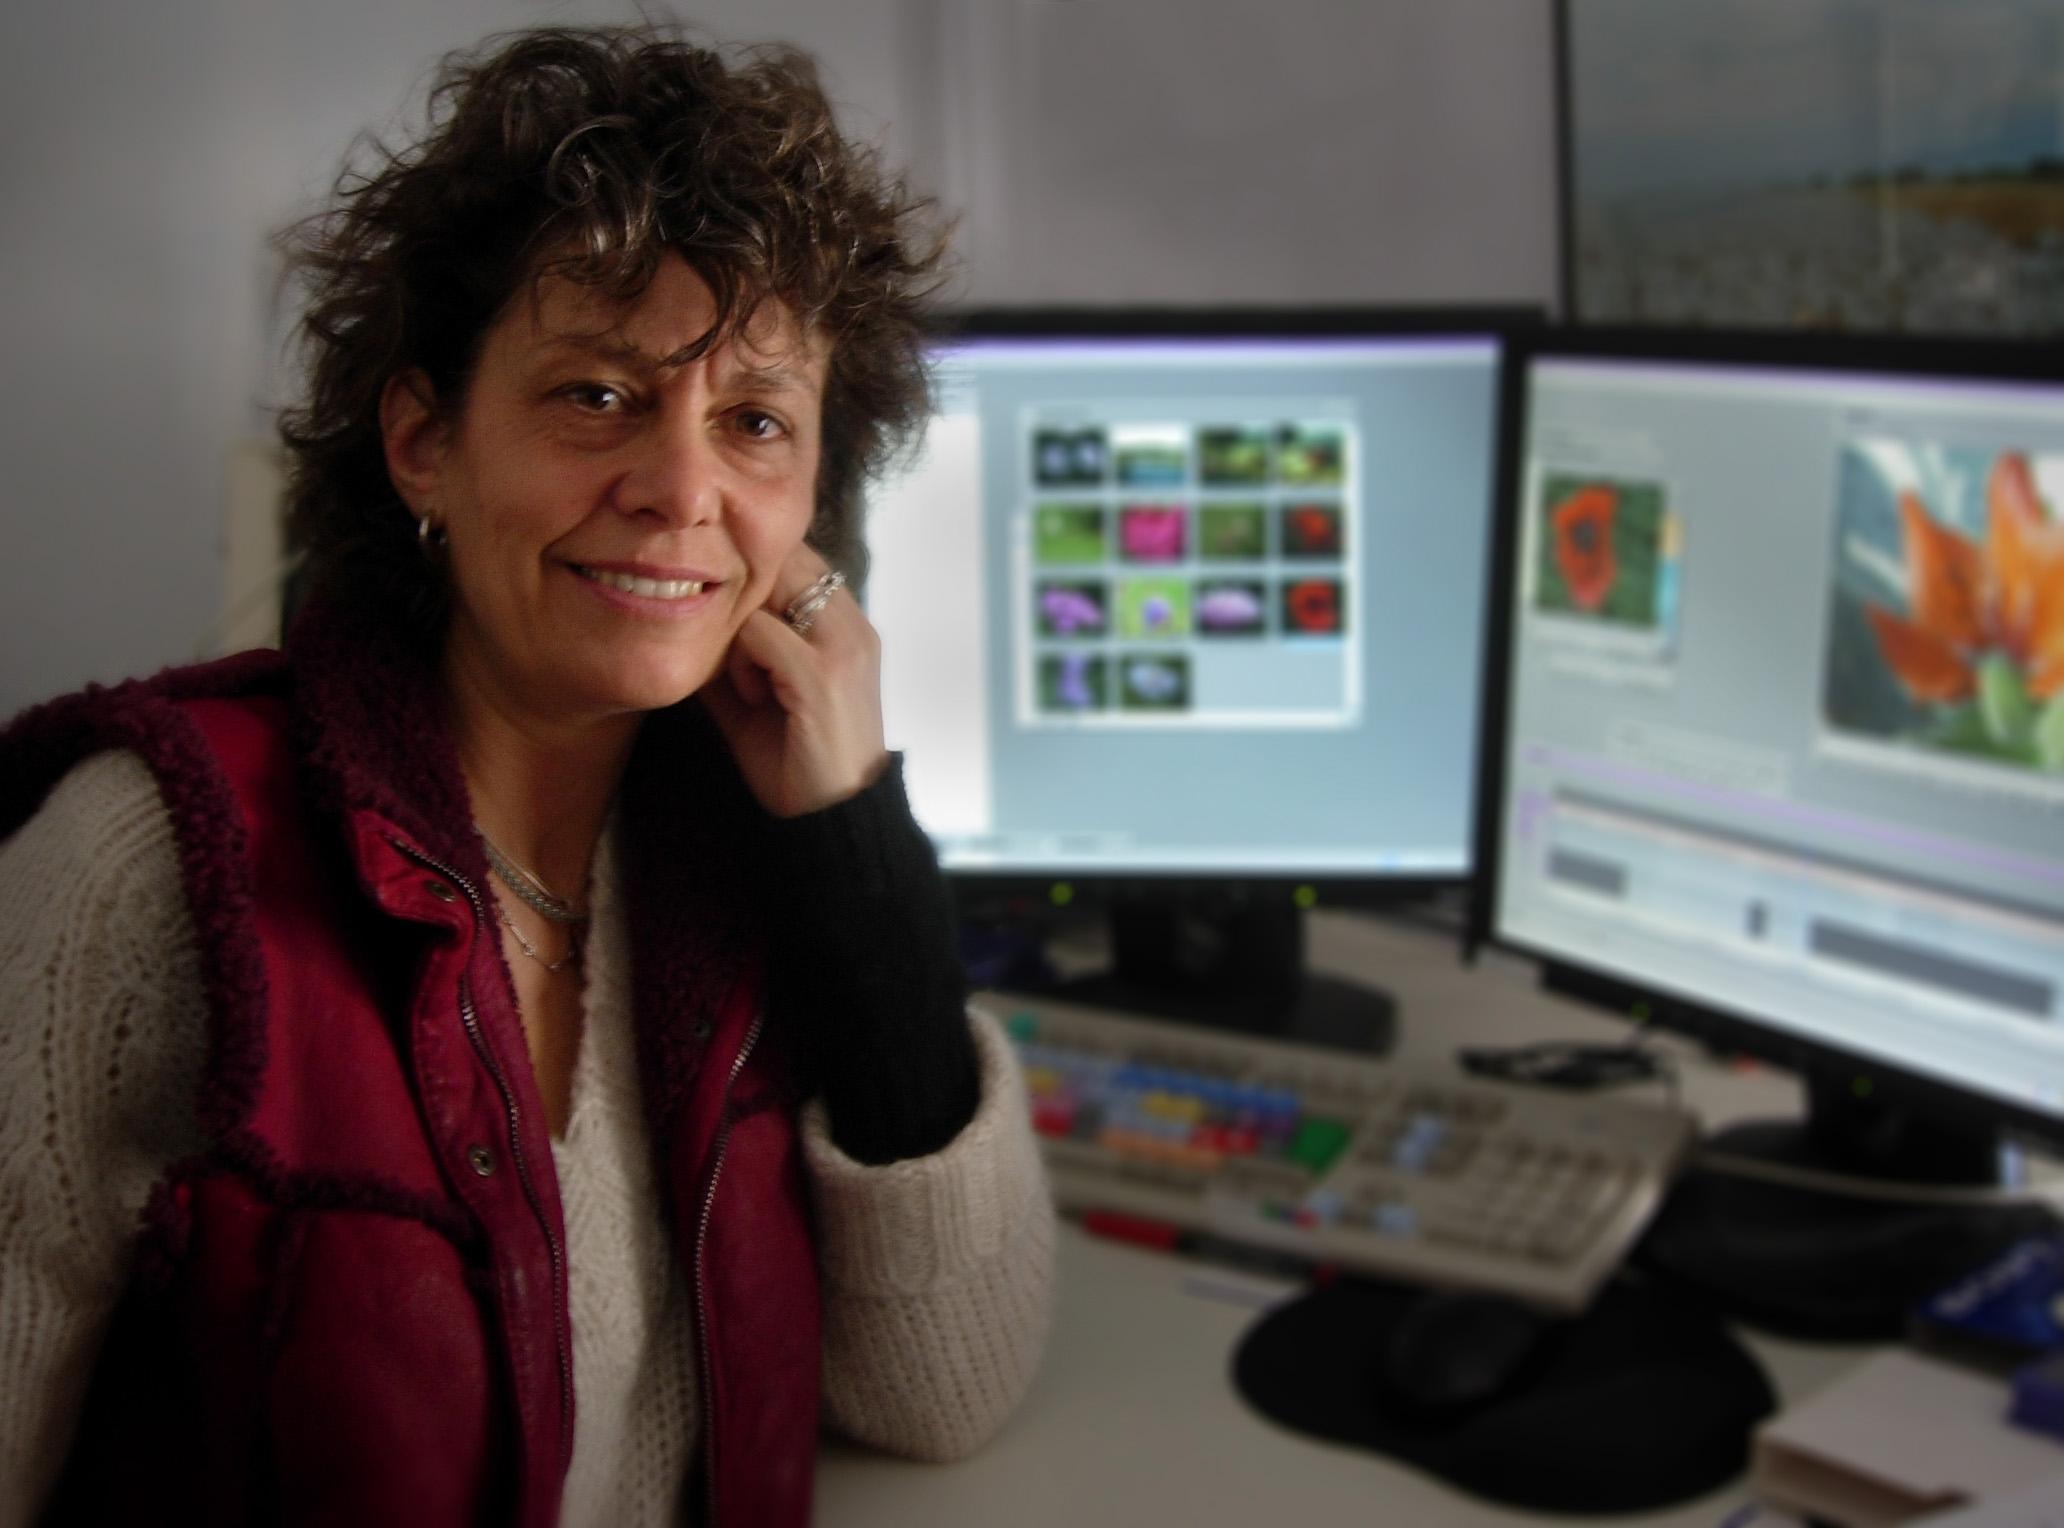 Anette Lykke Lundberg